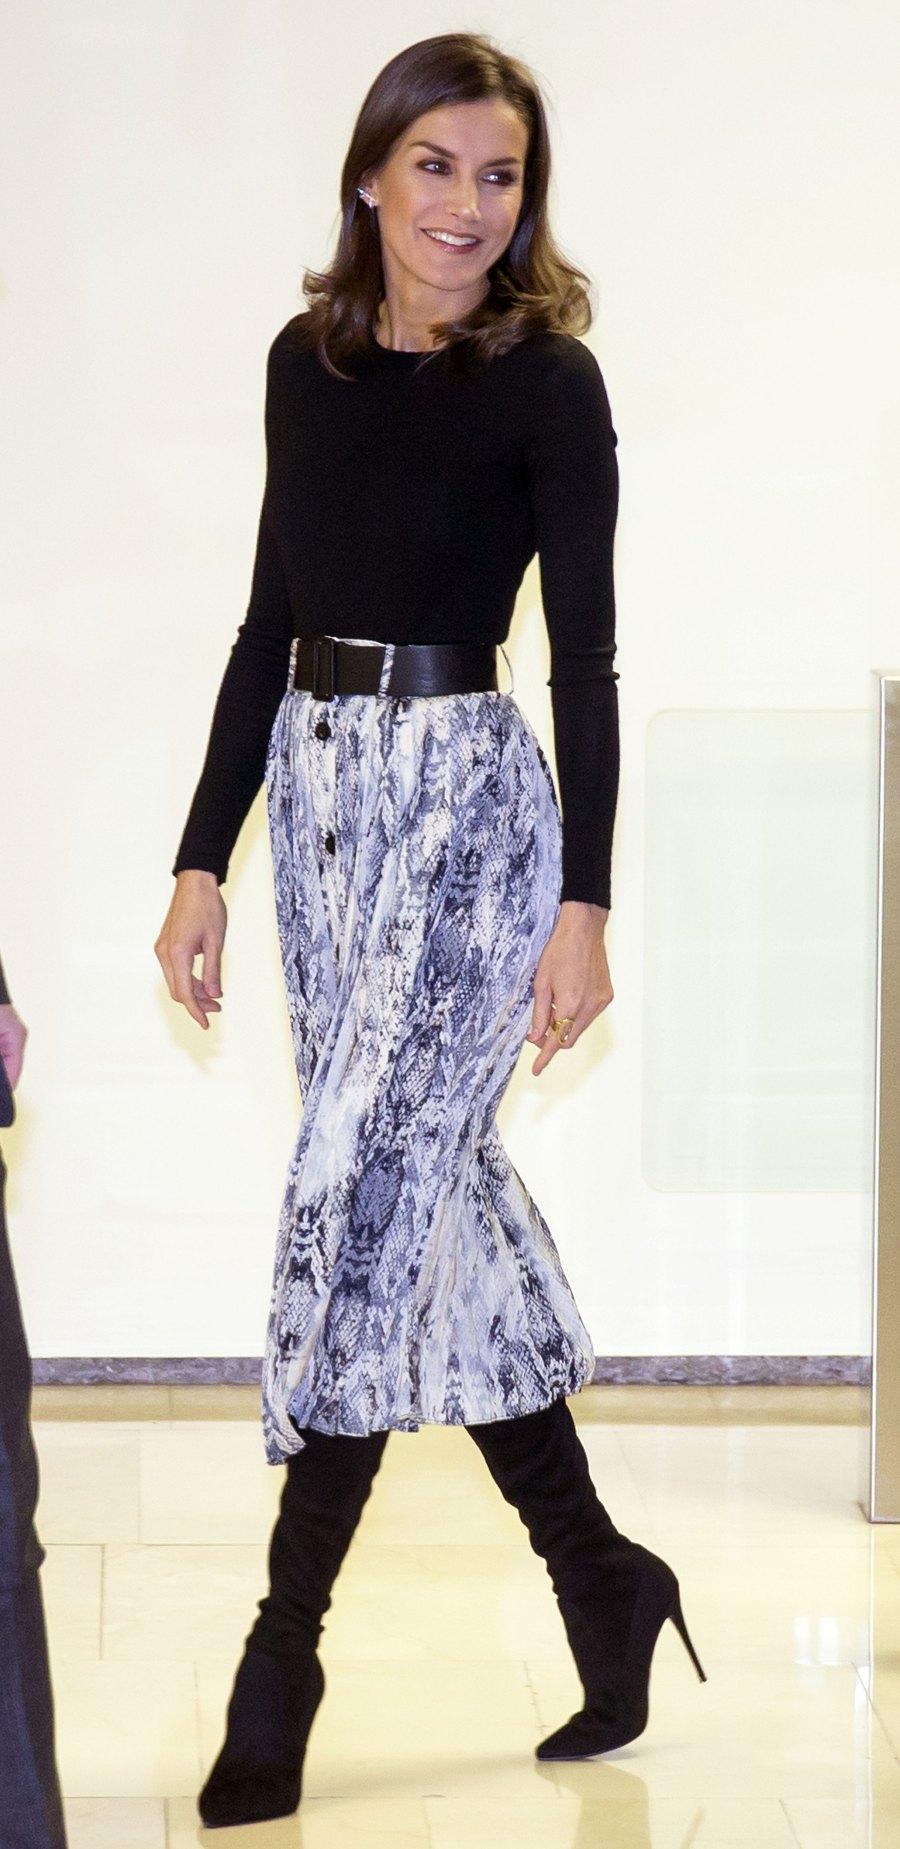 Queen Letizia Statement Skirt December 12, 2019